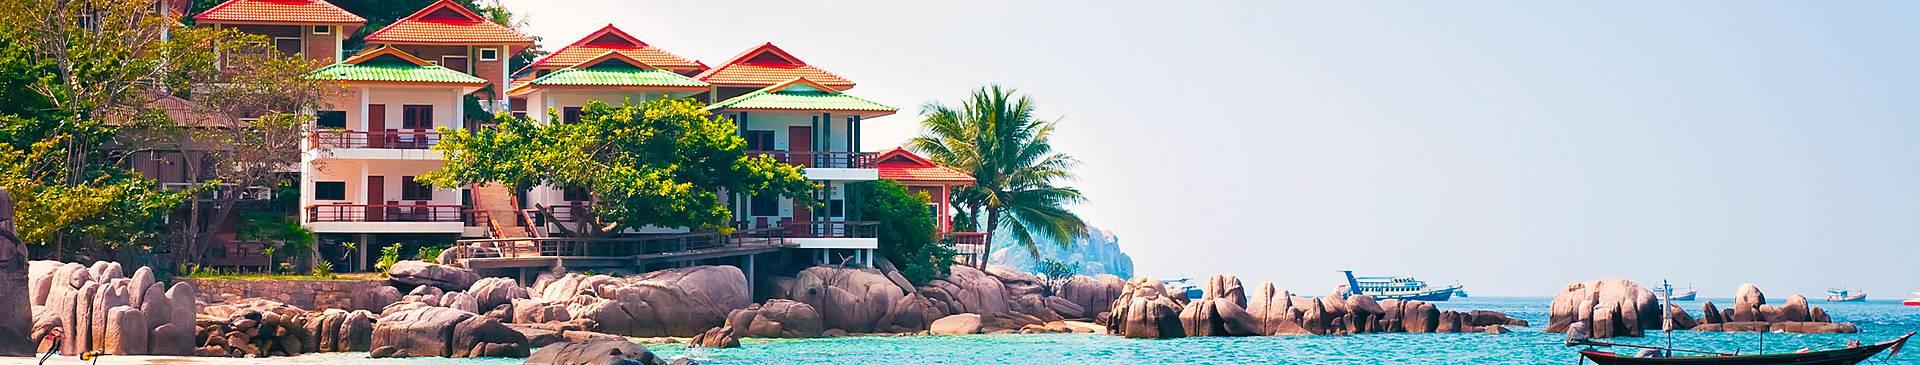 Une semaine en Thaïlande